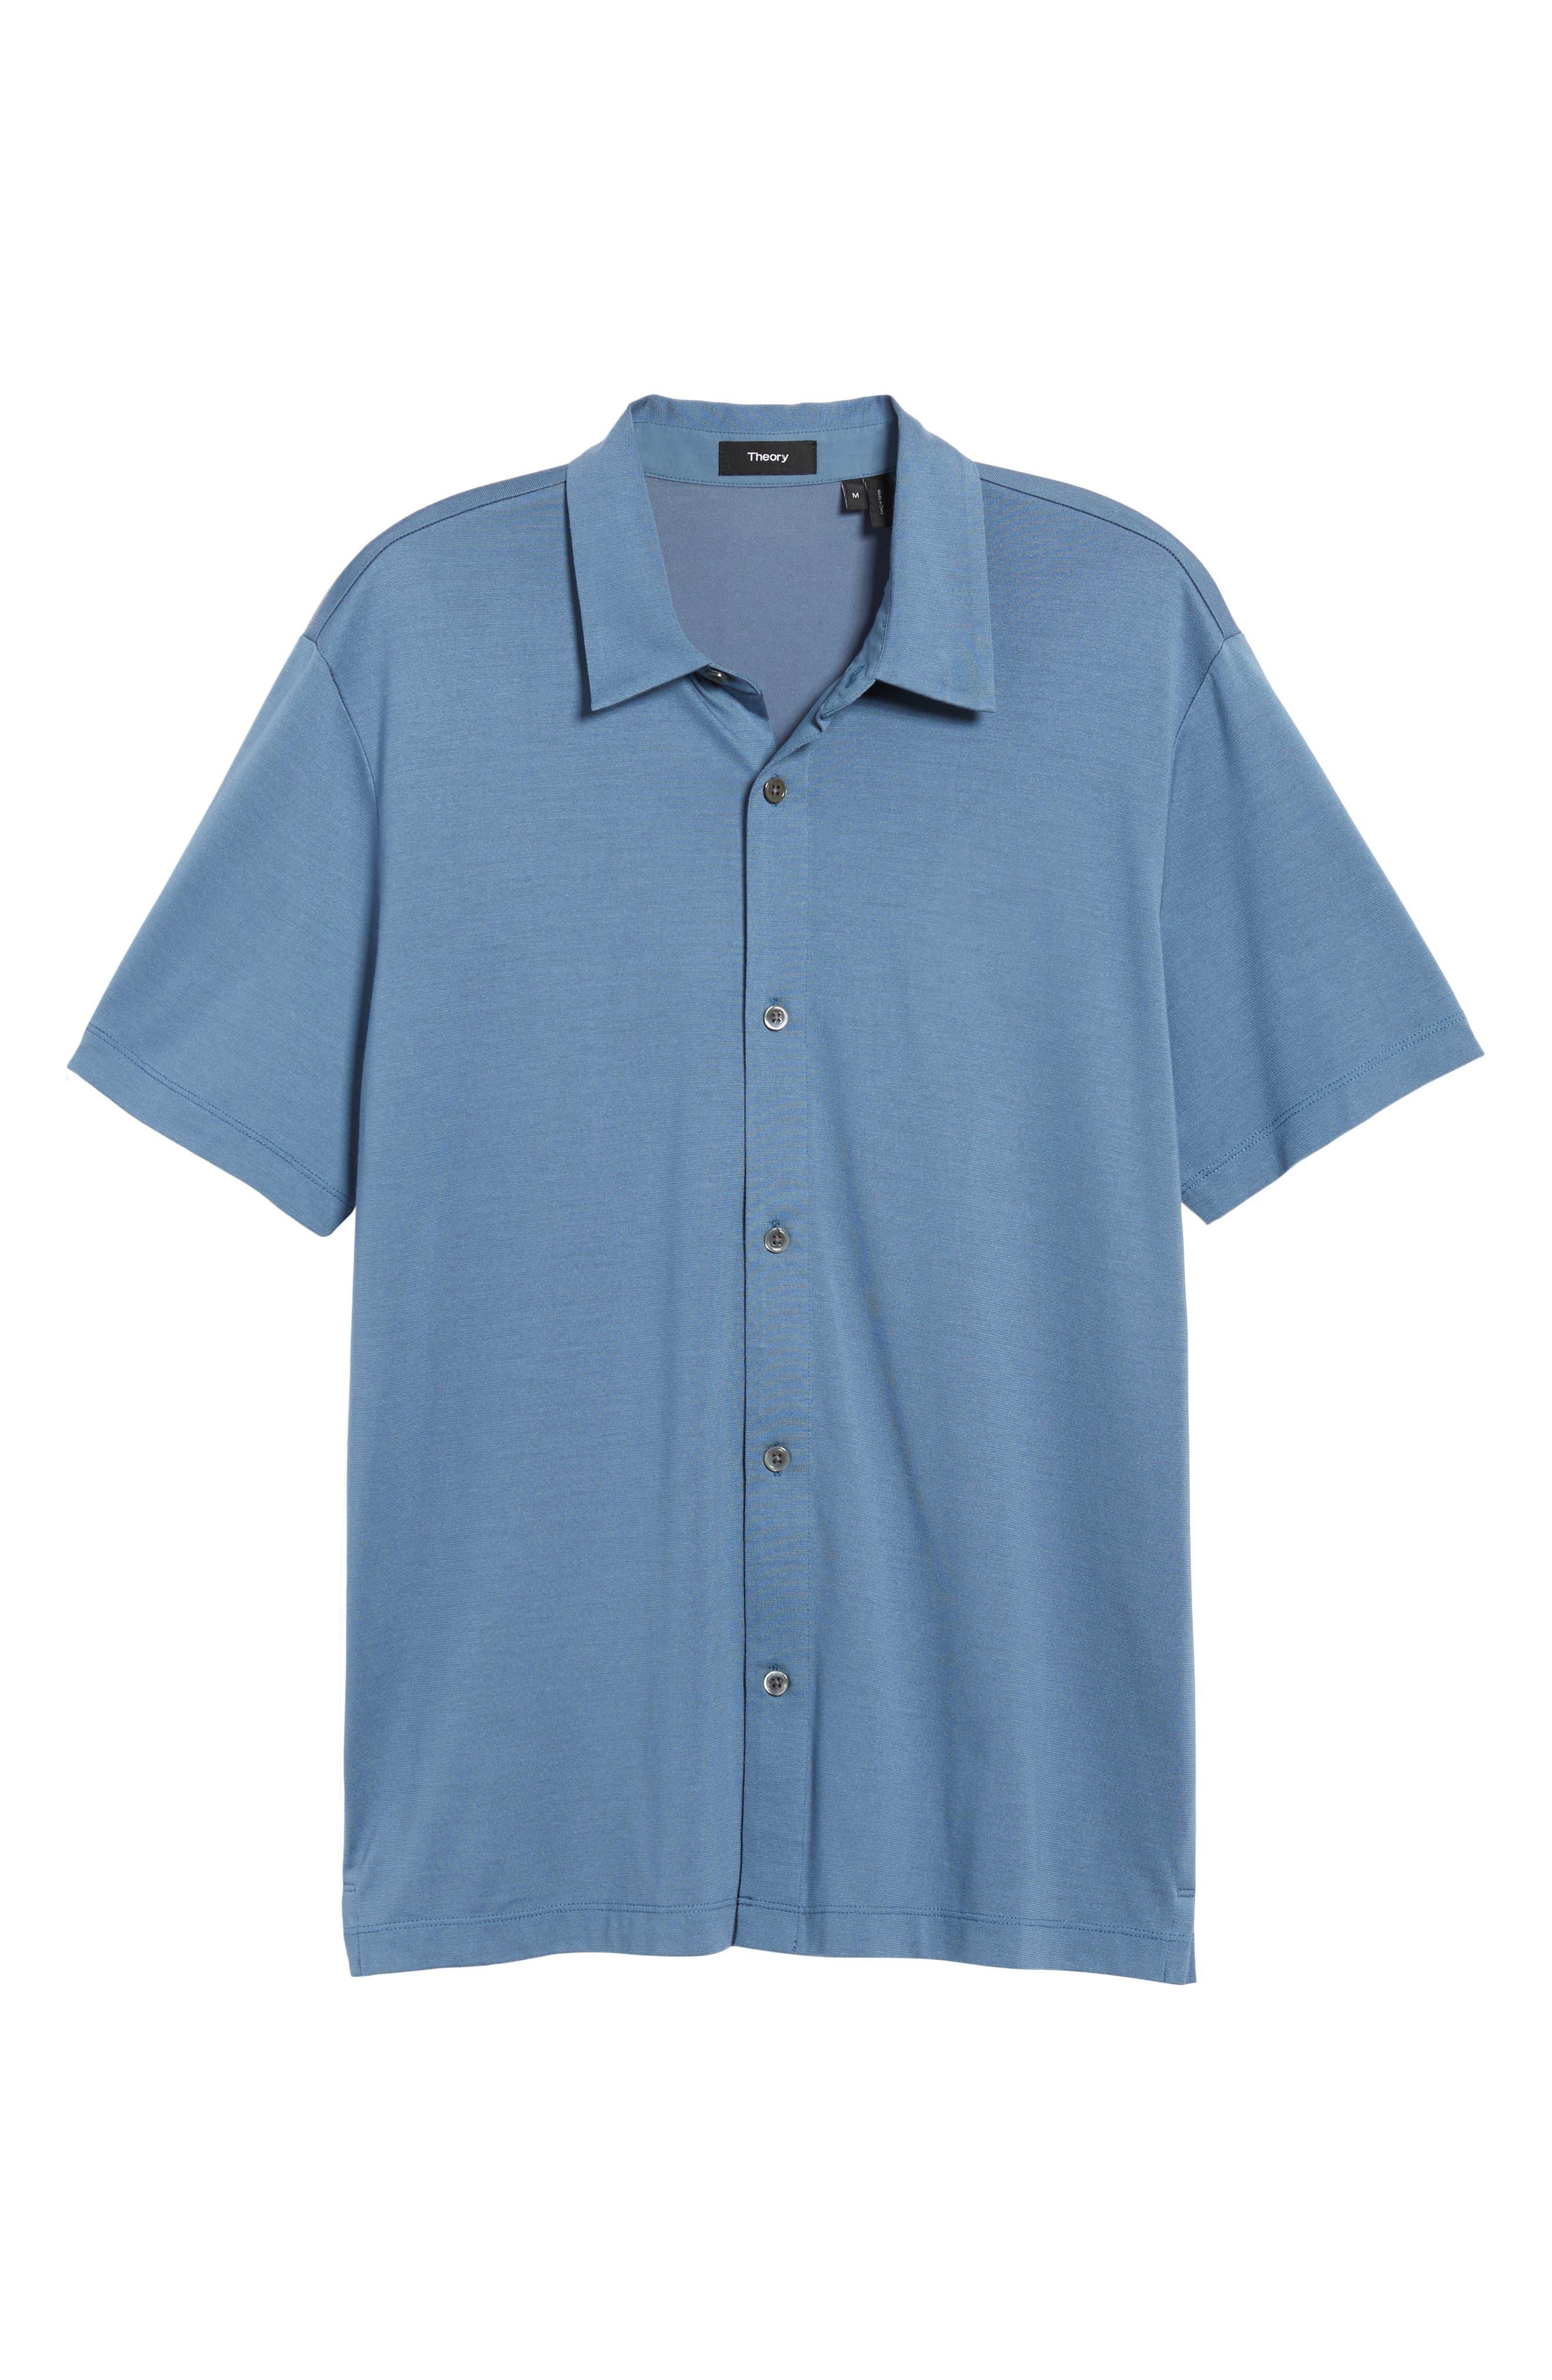 Incisive Silk & Cotton Short Sleeve Sport Shirt,                             Alternate thumbnail 6, color,                             Iris